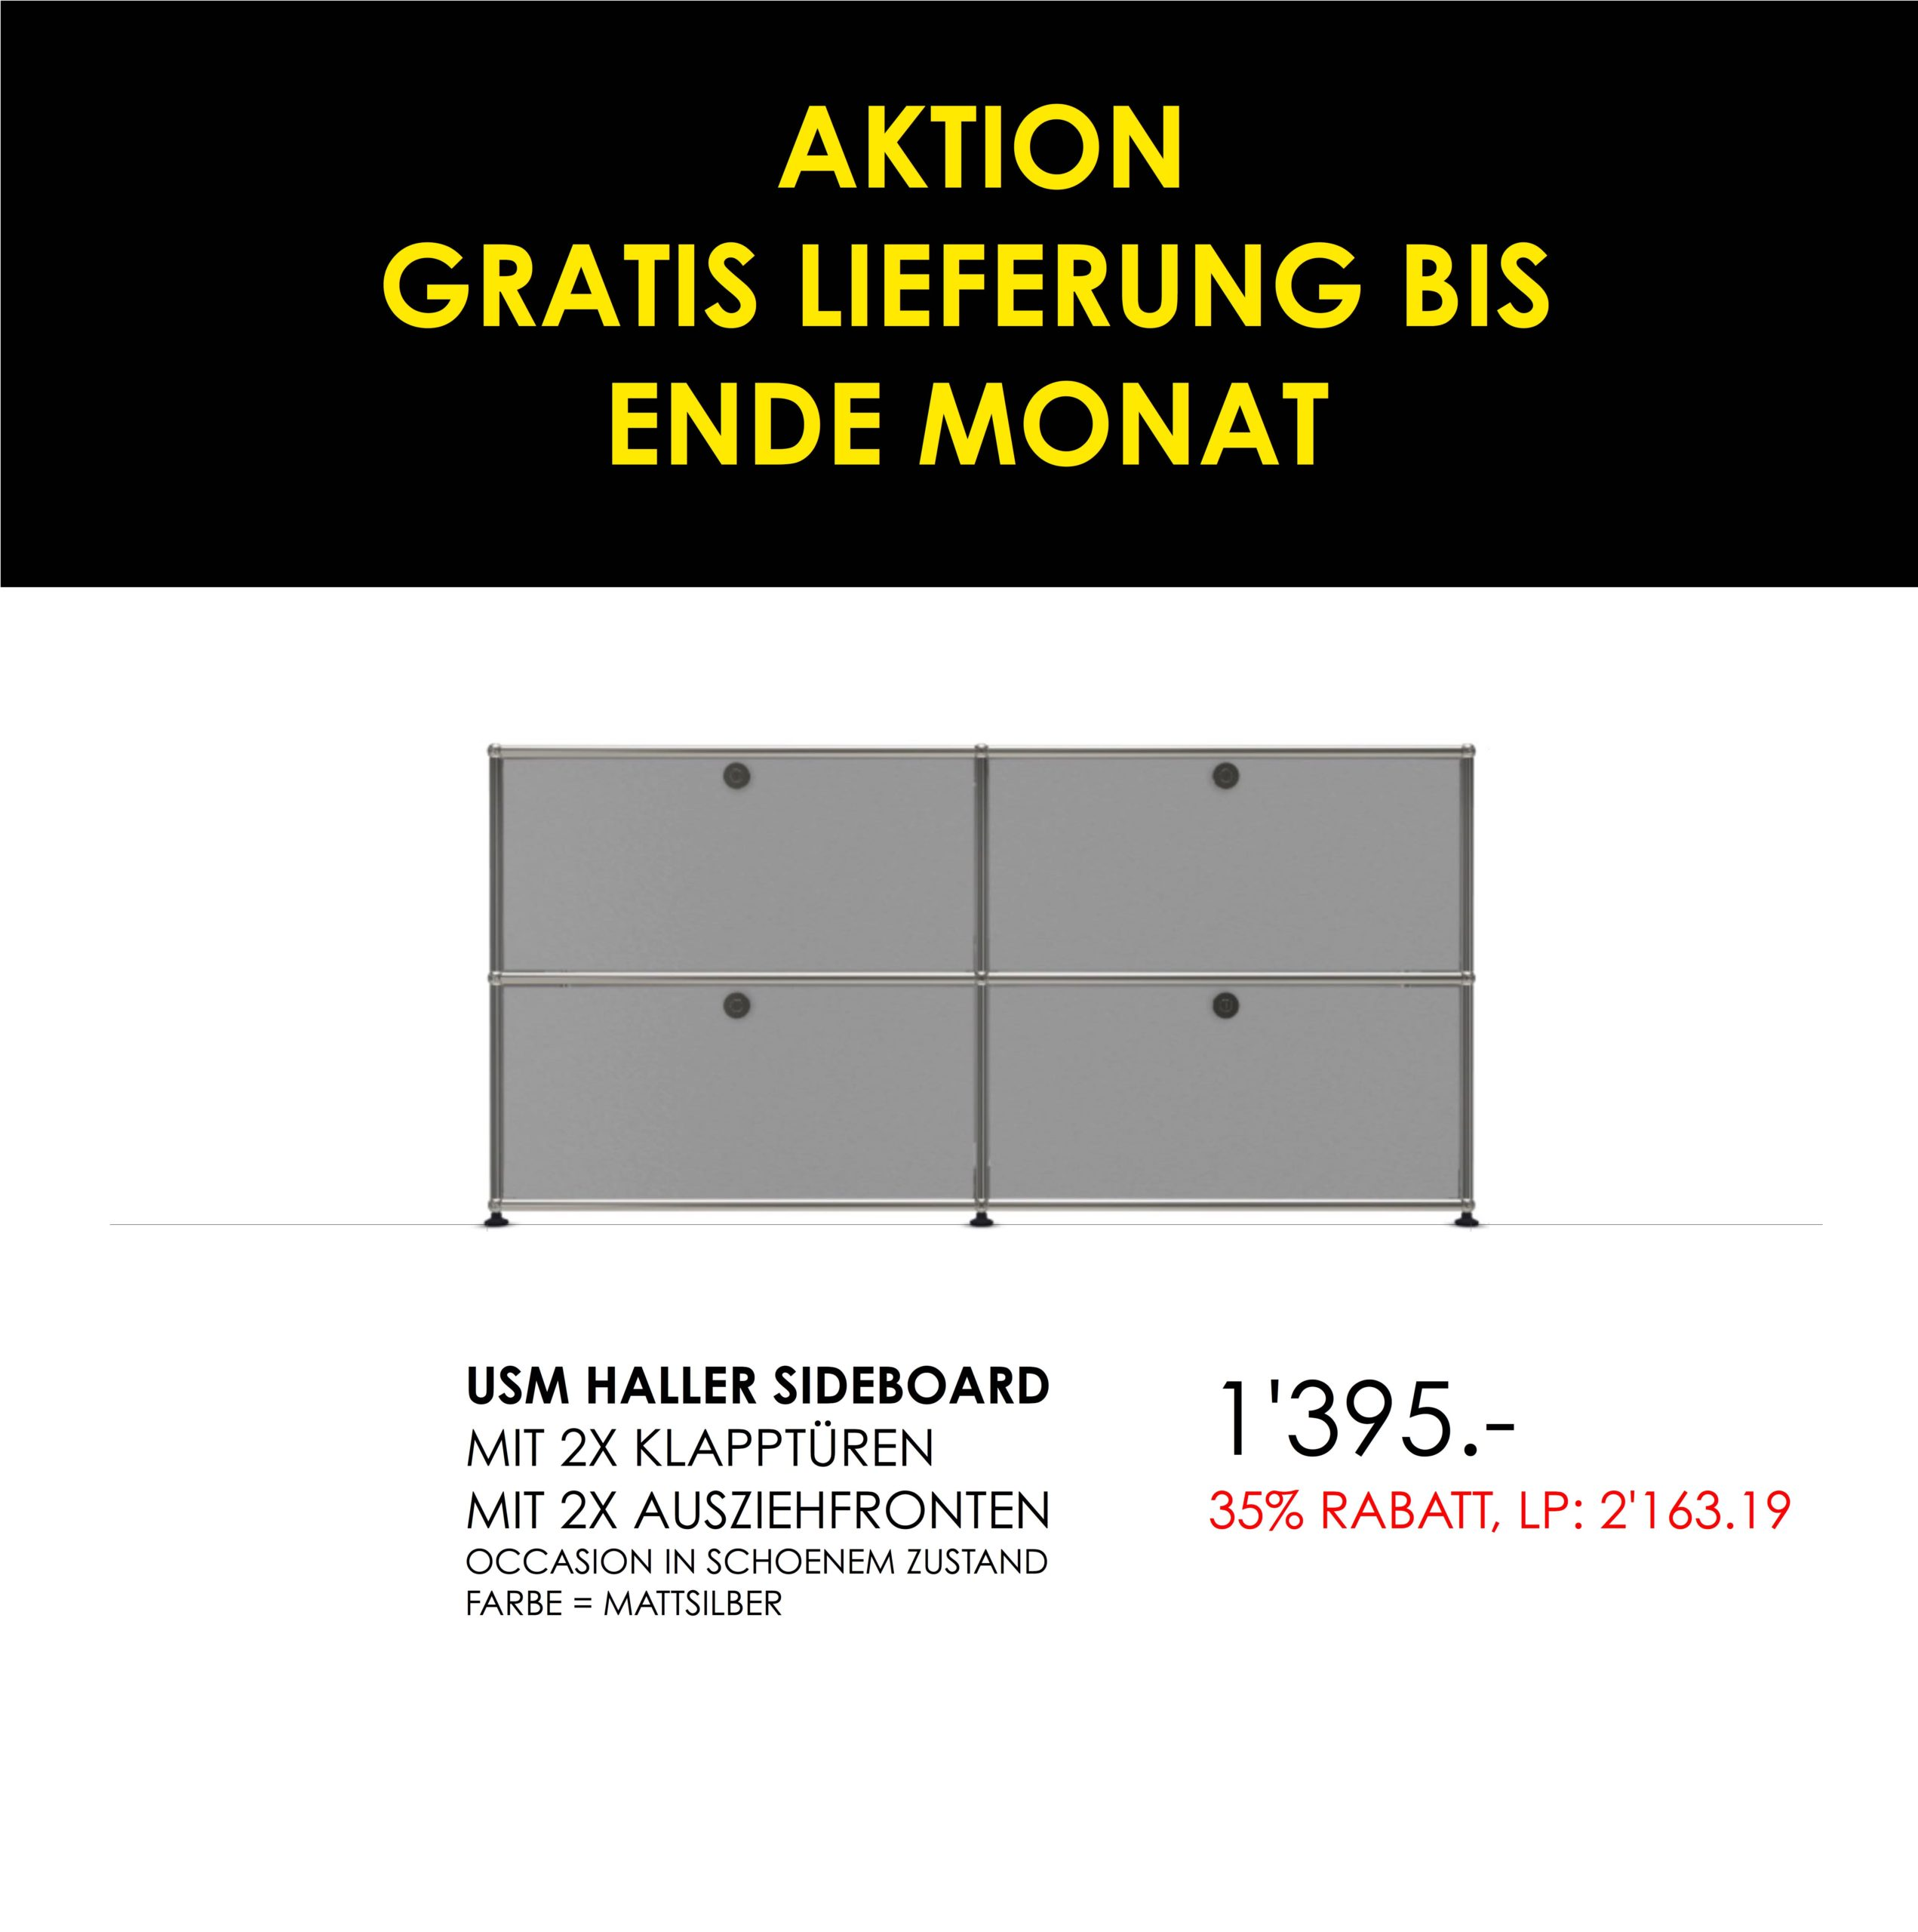 AKTION_Werbung